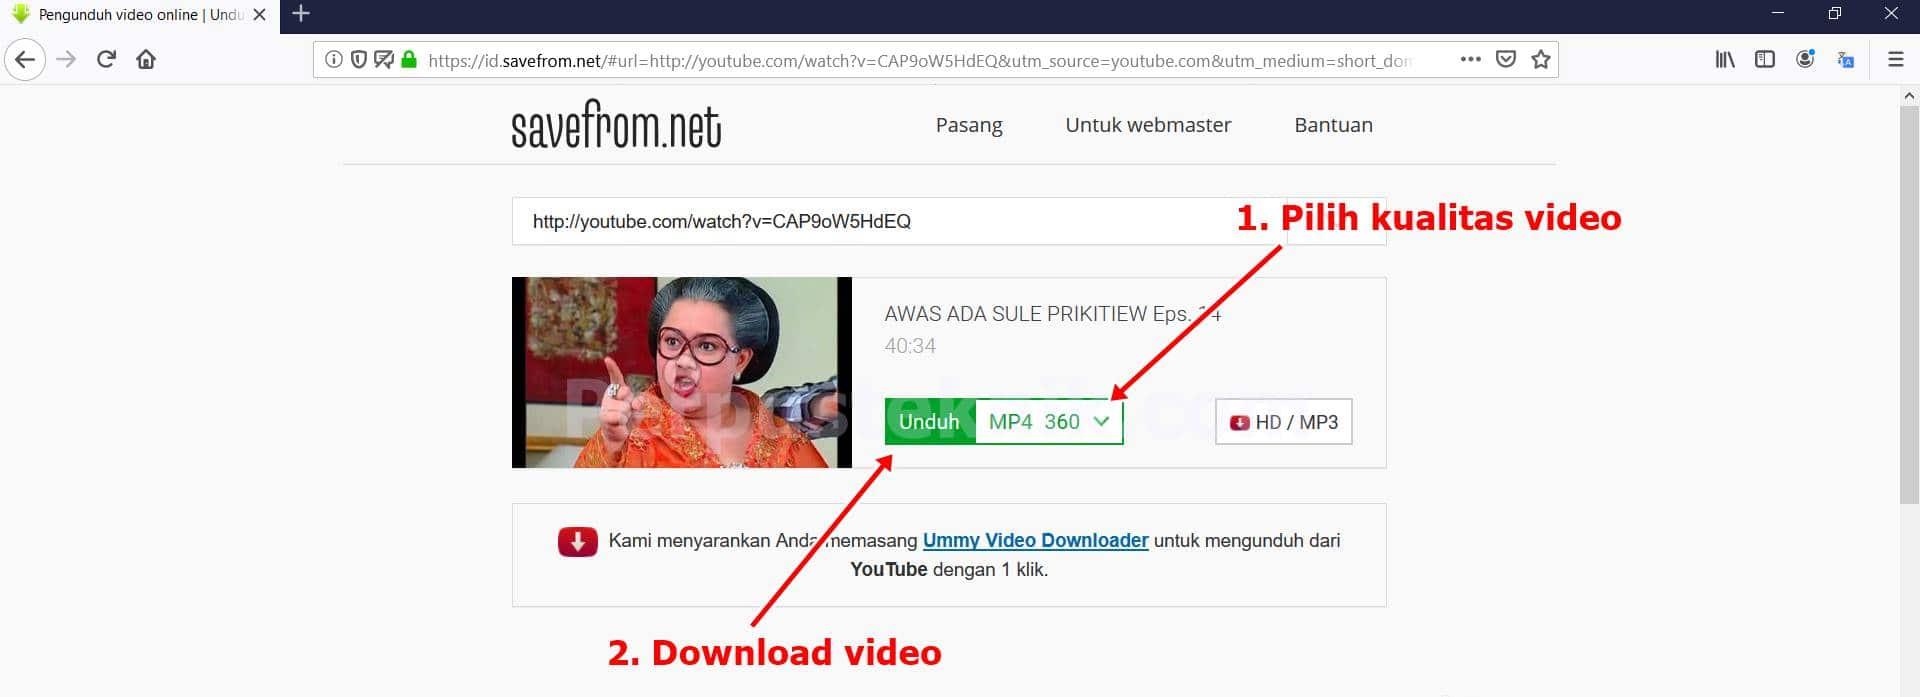 Cara download video youtube tanpa IDM !!